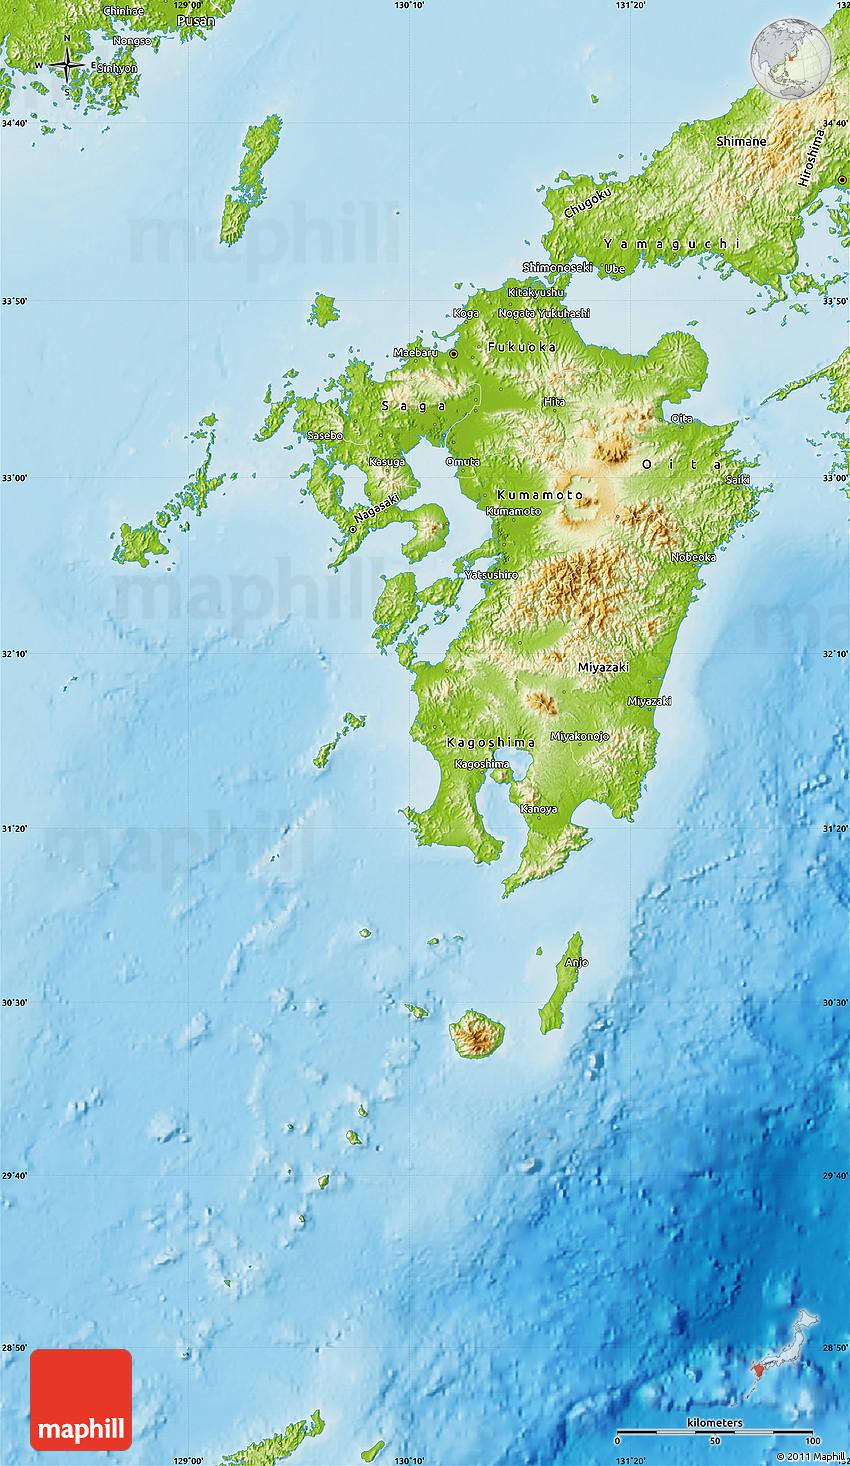 Physical Map of Kyushu on hainan map, okinawa island, fukuoka map, kuril islands, hiroshima map, sakhalin island map, ryukyu islands map, miyazaki map, kagoshima prefecture, kanto map, japanese archipelago, japanese archipelago map, ryukyu islands, fukuoka prefecture, japan map, okinawa map, manchurian plain map, nagasaki prefecture, gobi desert map, shikoku map, sea of japan, japanese alps map, hokkaido map, honshu map, sumatra map, bangkok map, loess plateau map, kuril islands map, okinawa prefecture,